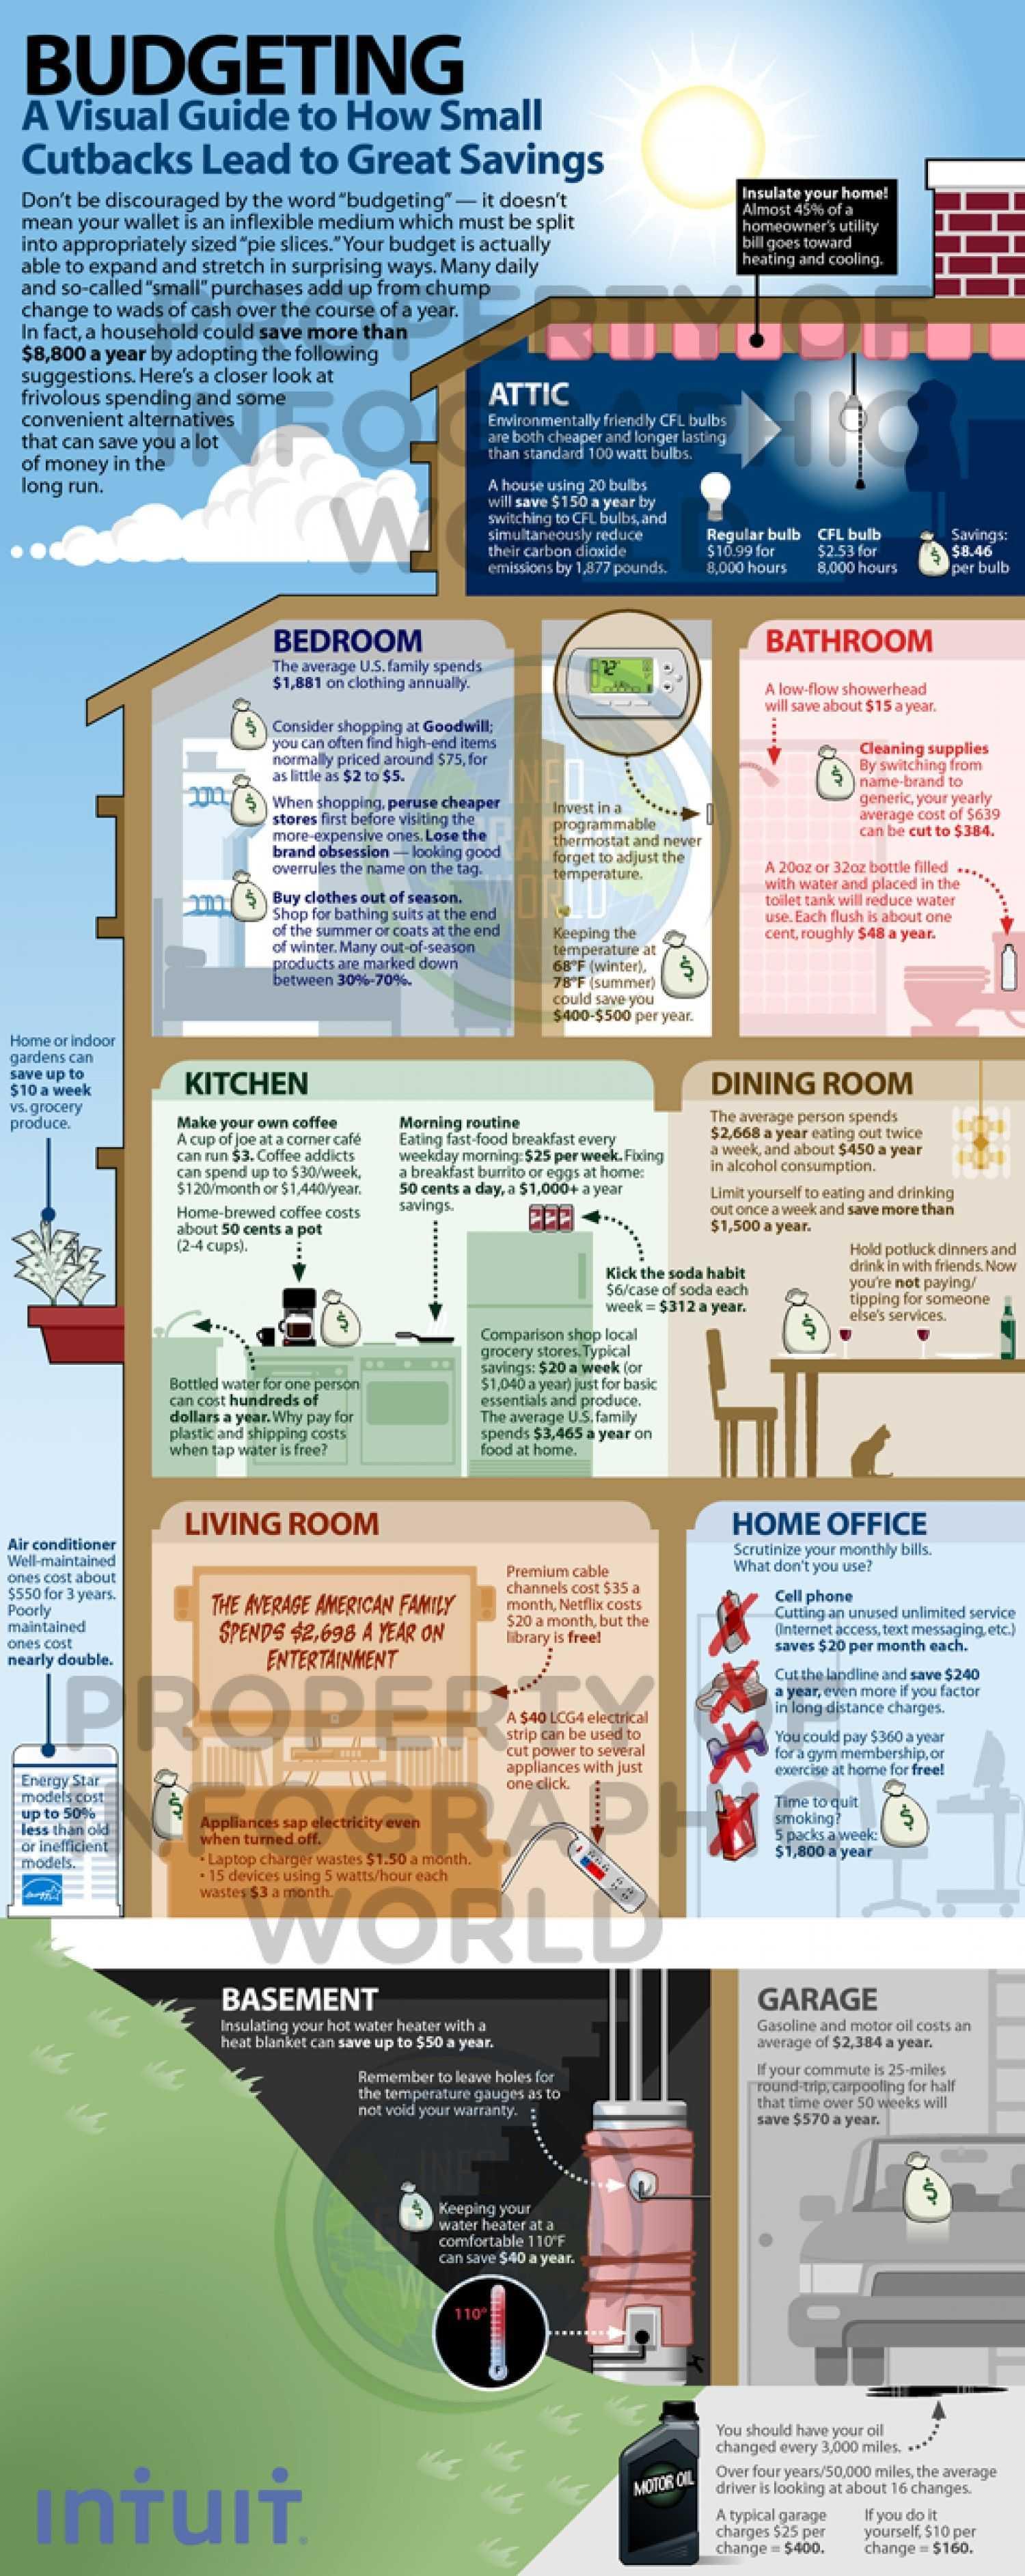 Beautiful Budgeting Infographic